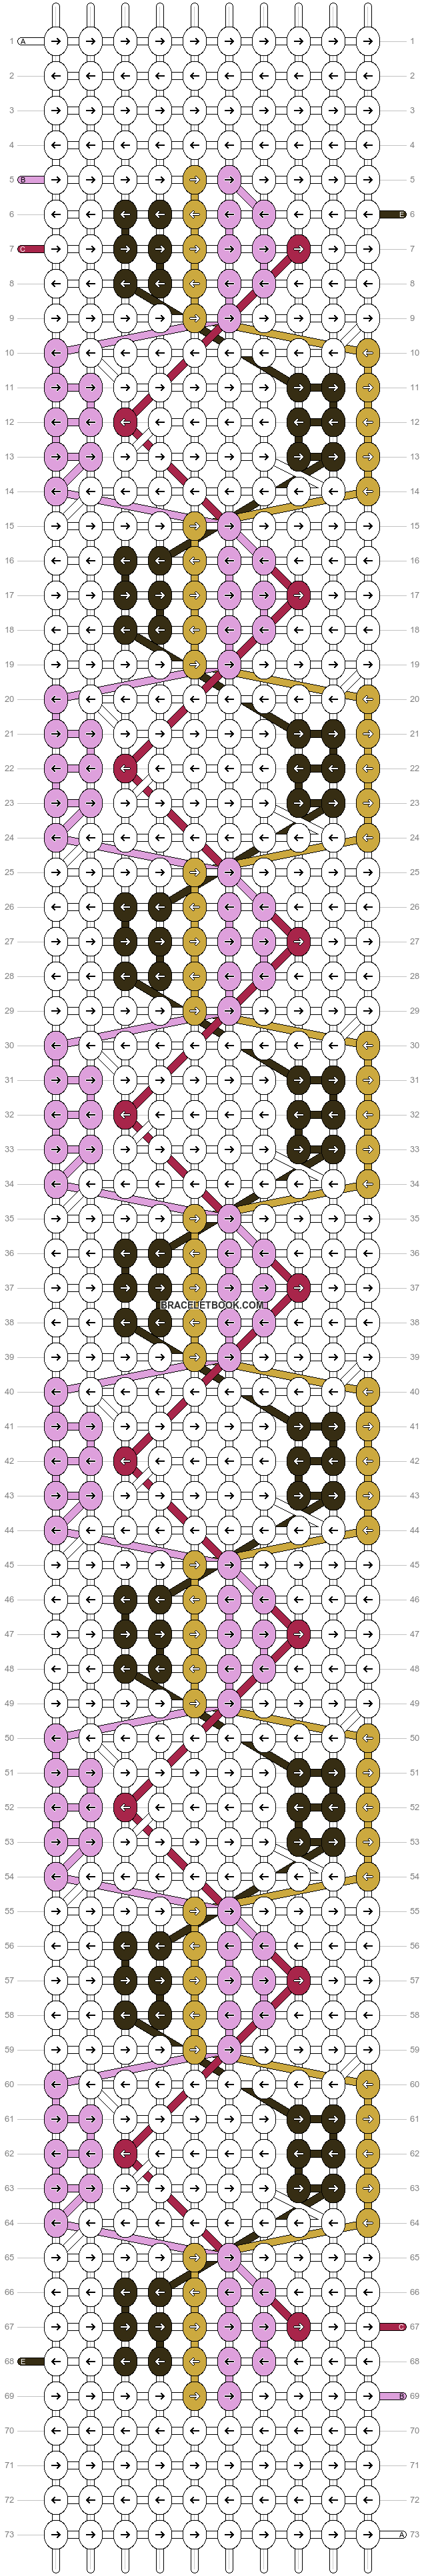 Alpha pattern #38964 pattern